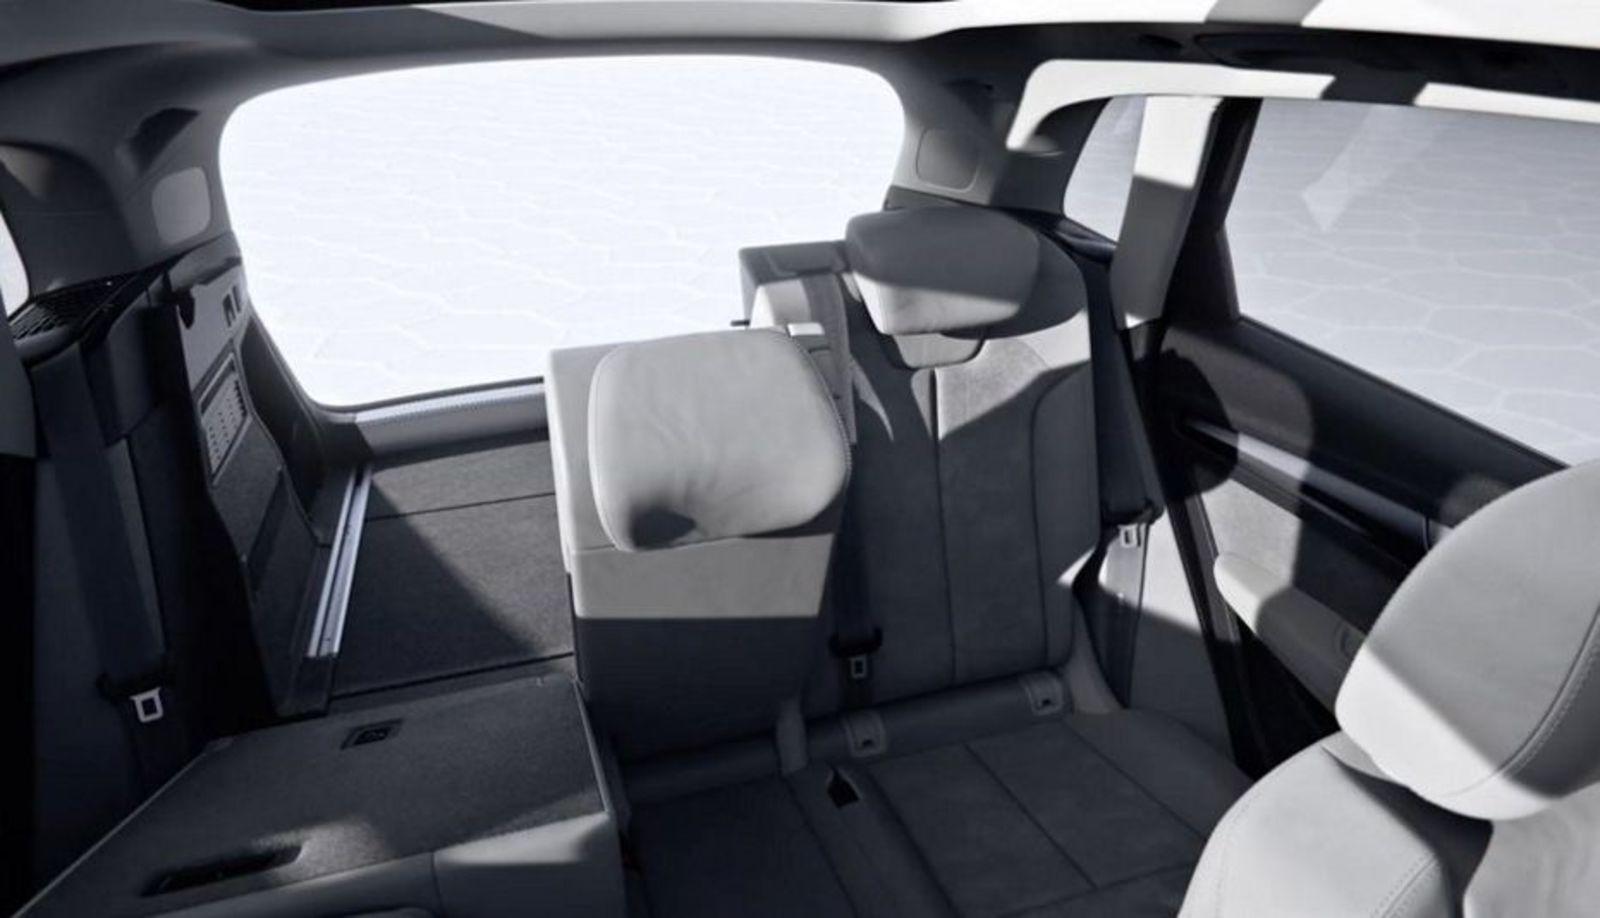 2018 Audi Q5 Leasing near Huntington, NY - Legend Auto Group